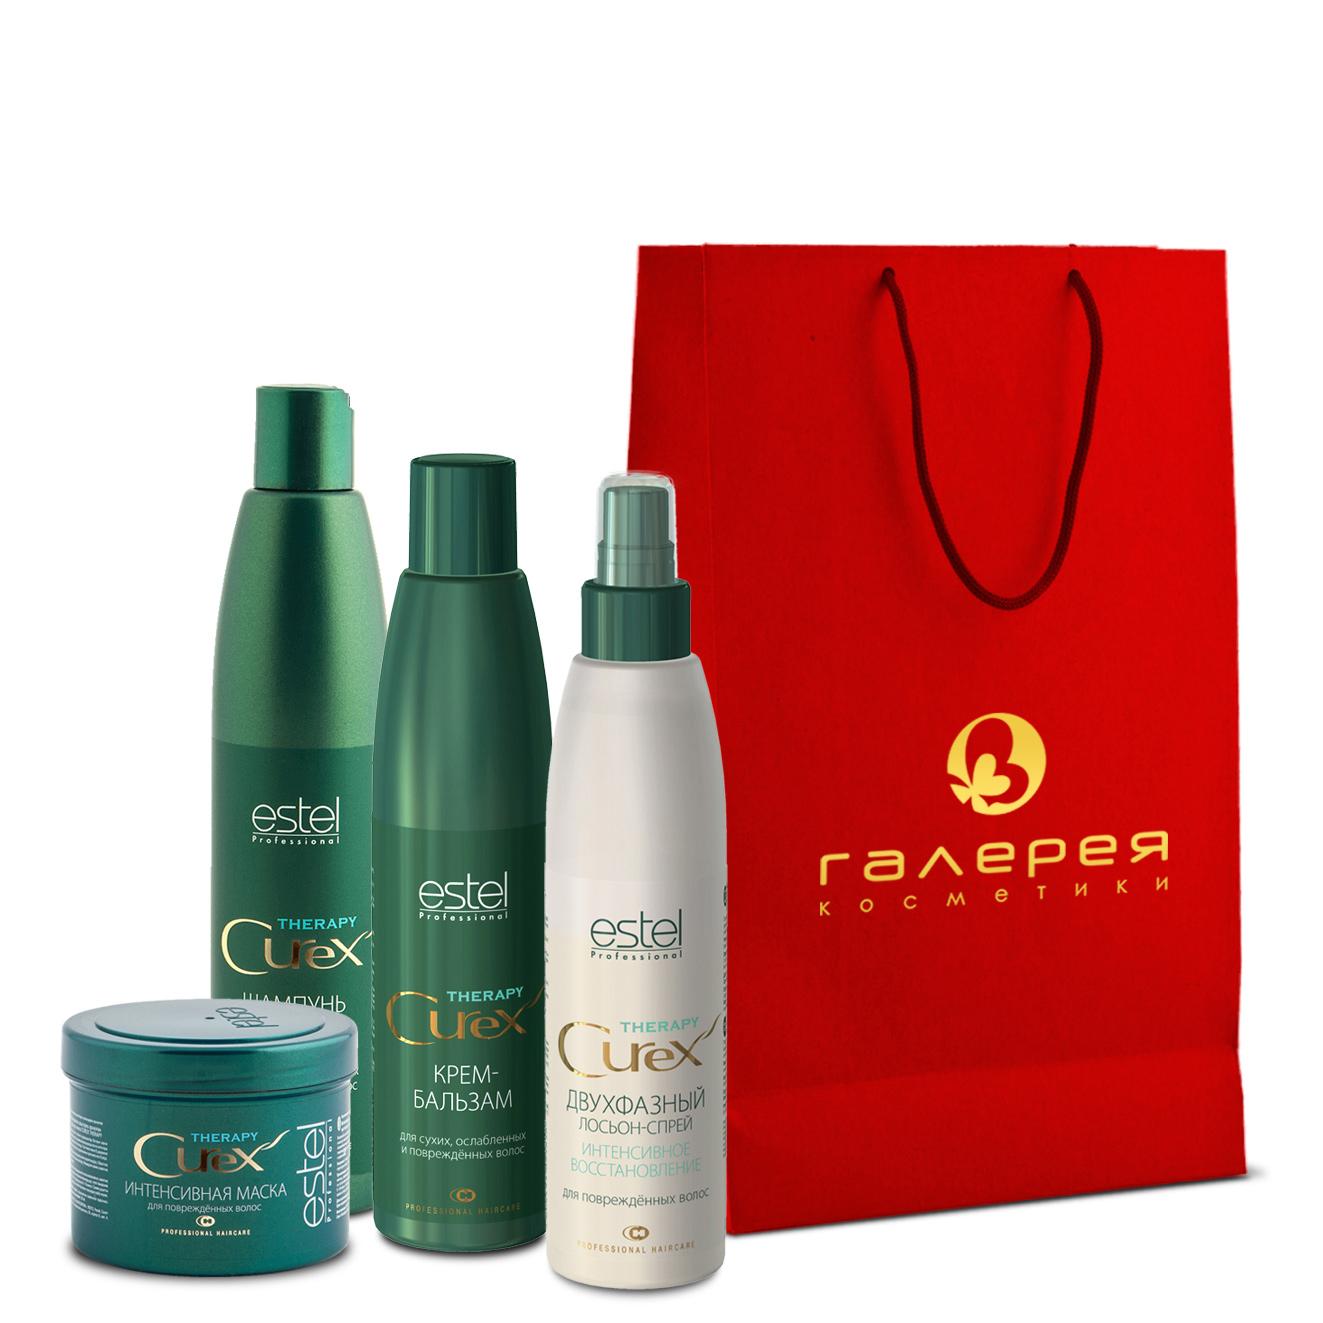 ESTEL PROFESSIONAL Набор Послушные волосы / Curex Therapy estel professional шампунь для окрашенных волос curex color save 300мл